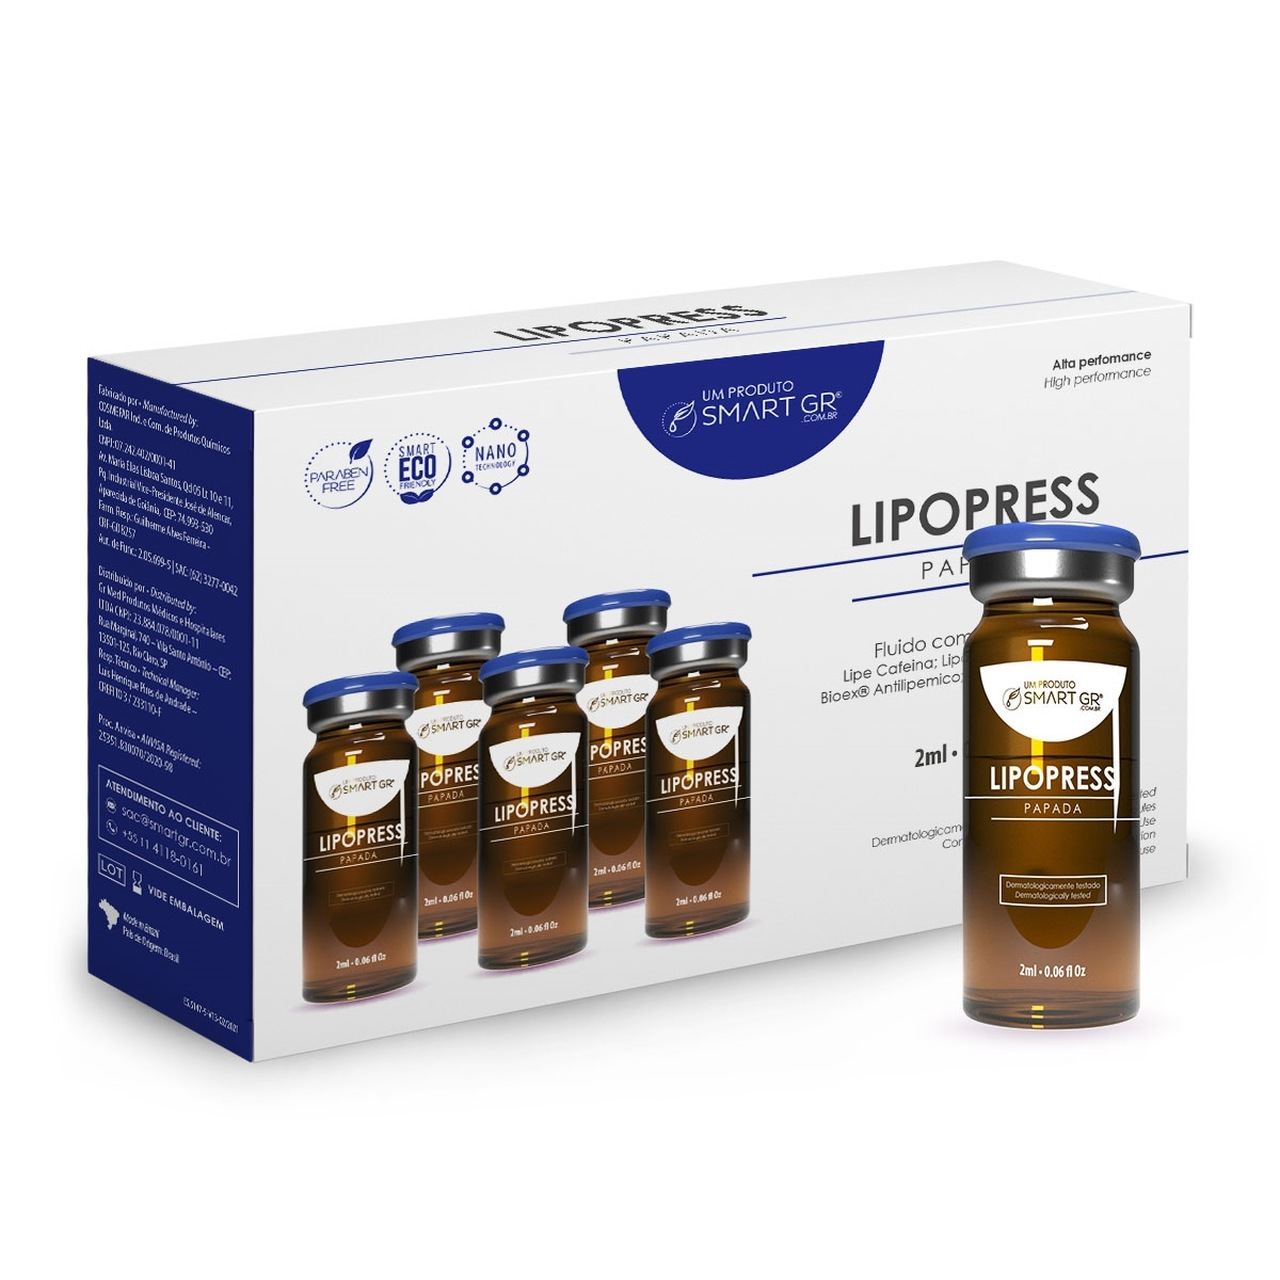 Kit Lipopress 5 Ampolas Liporedutor - 5 Frascos de 2 ml - Smart GR